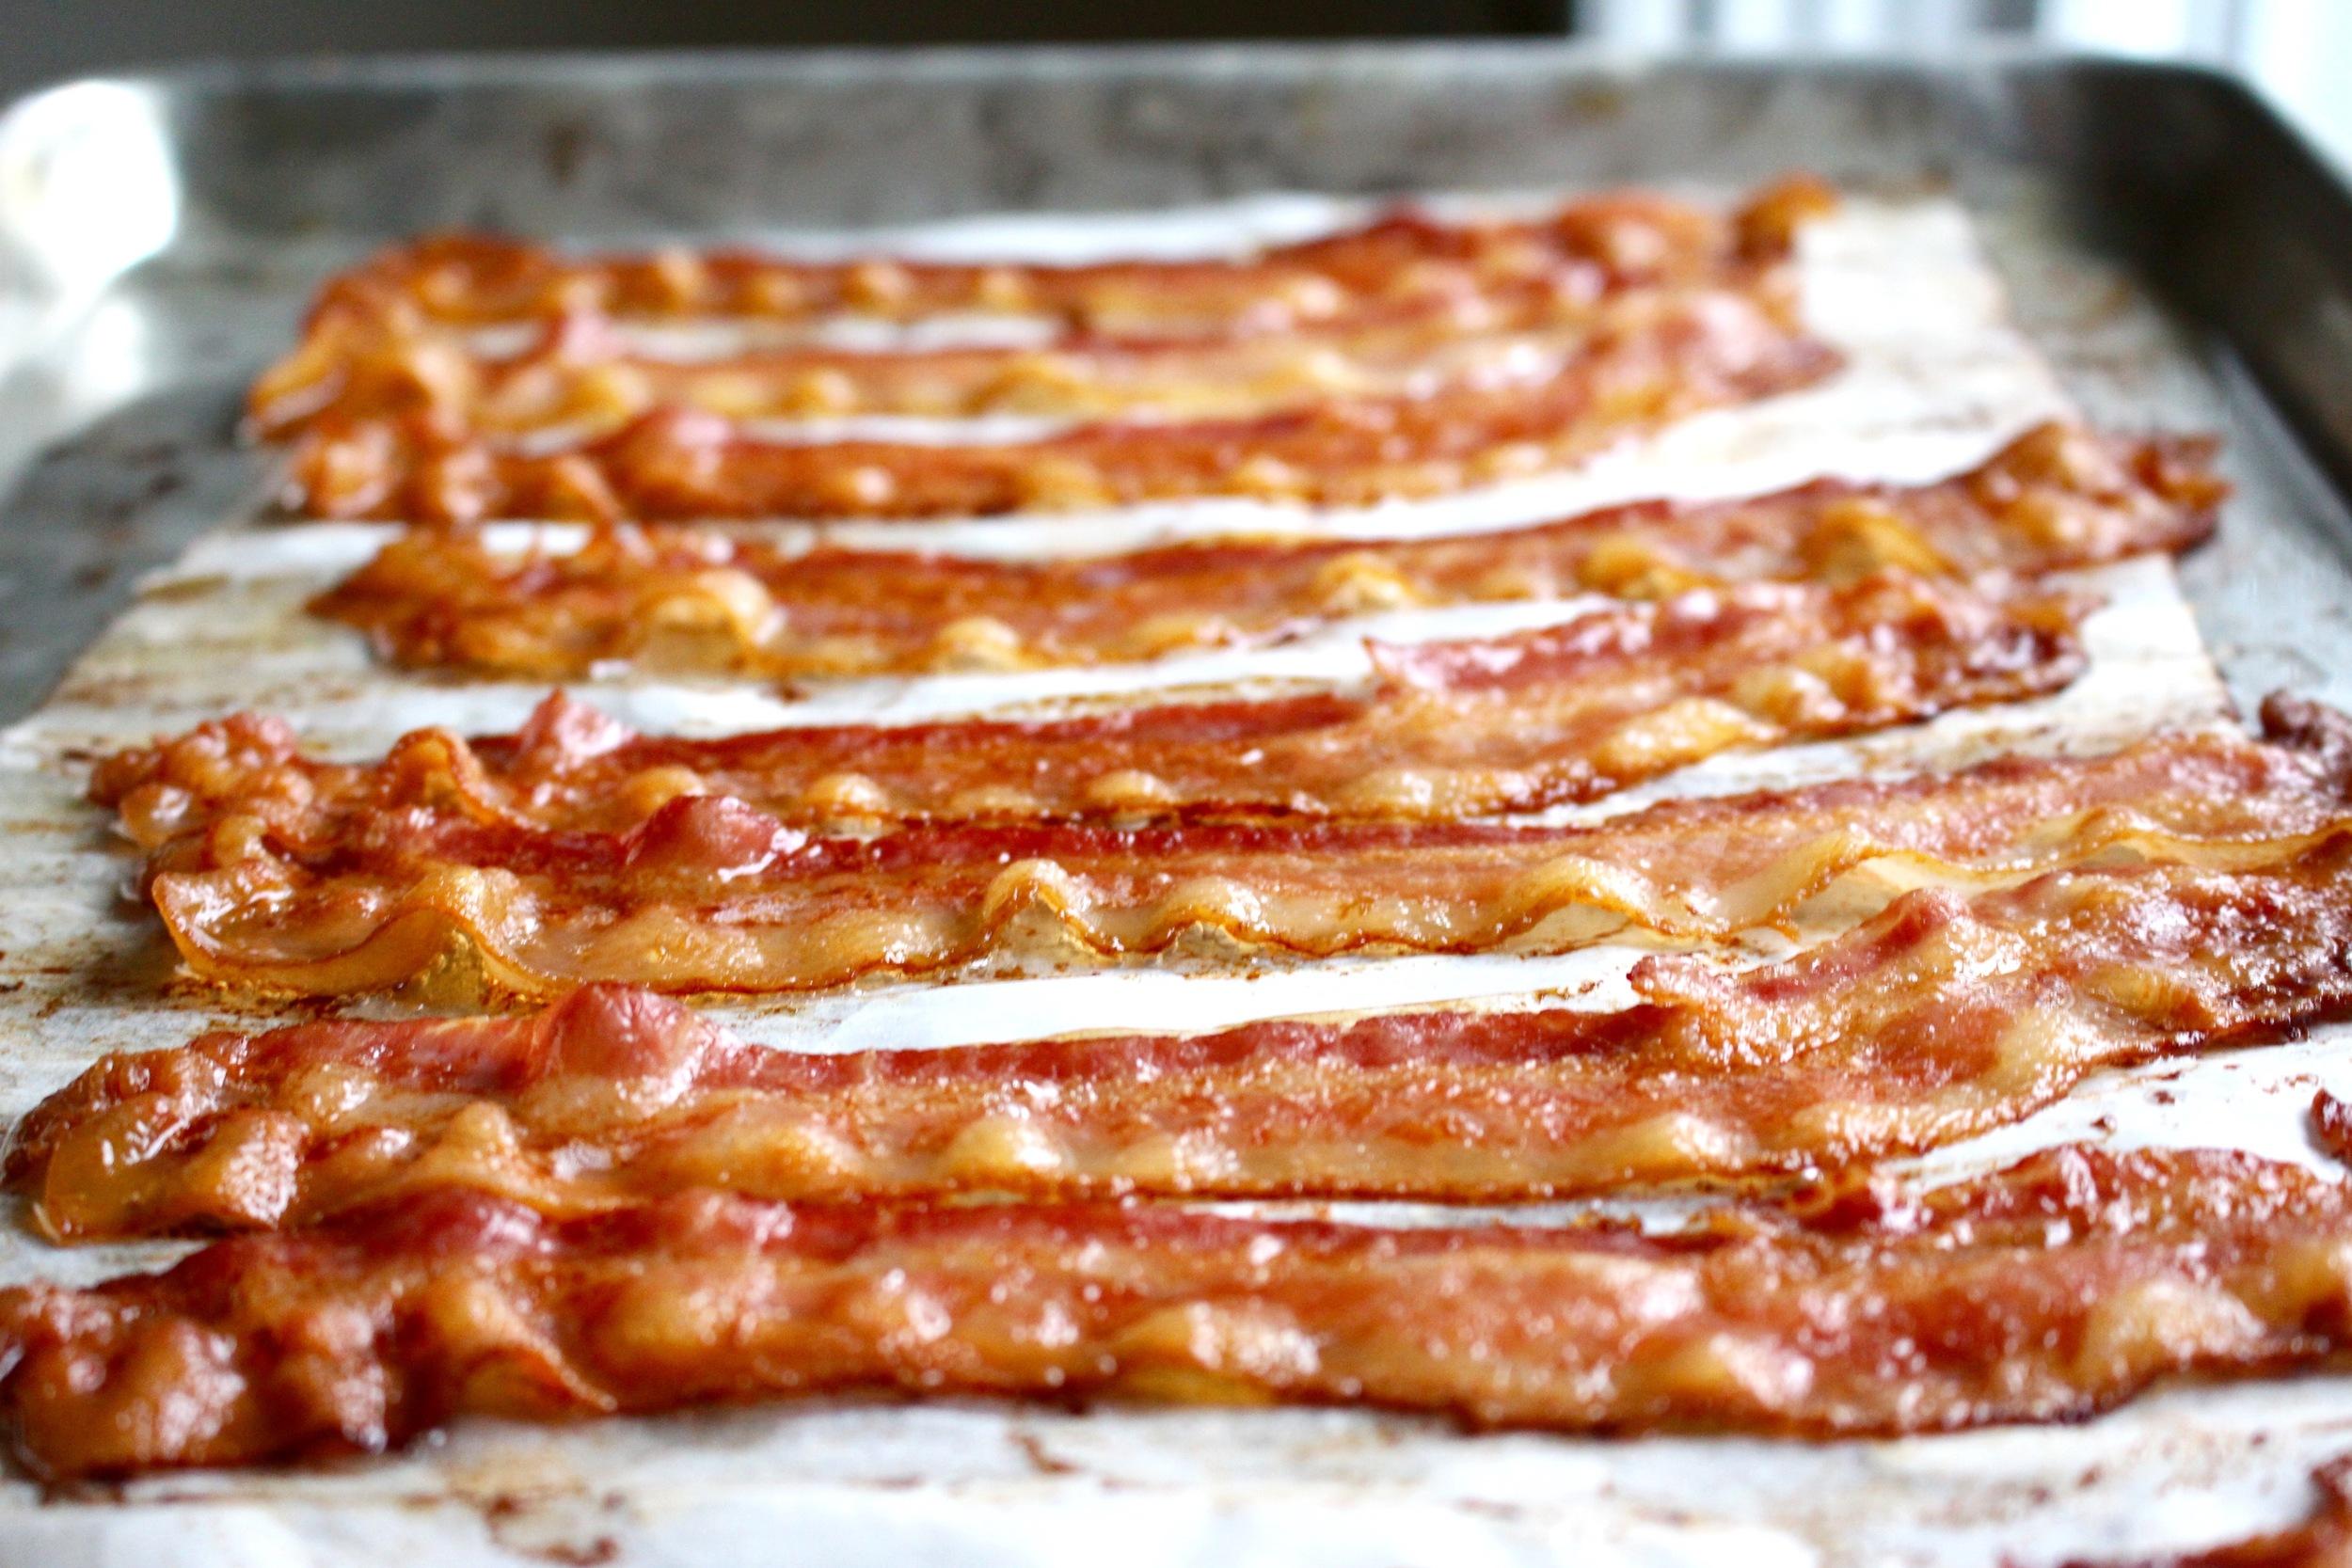 Citrus Smoked Bacon